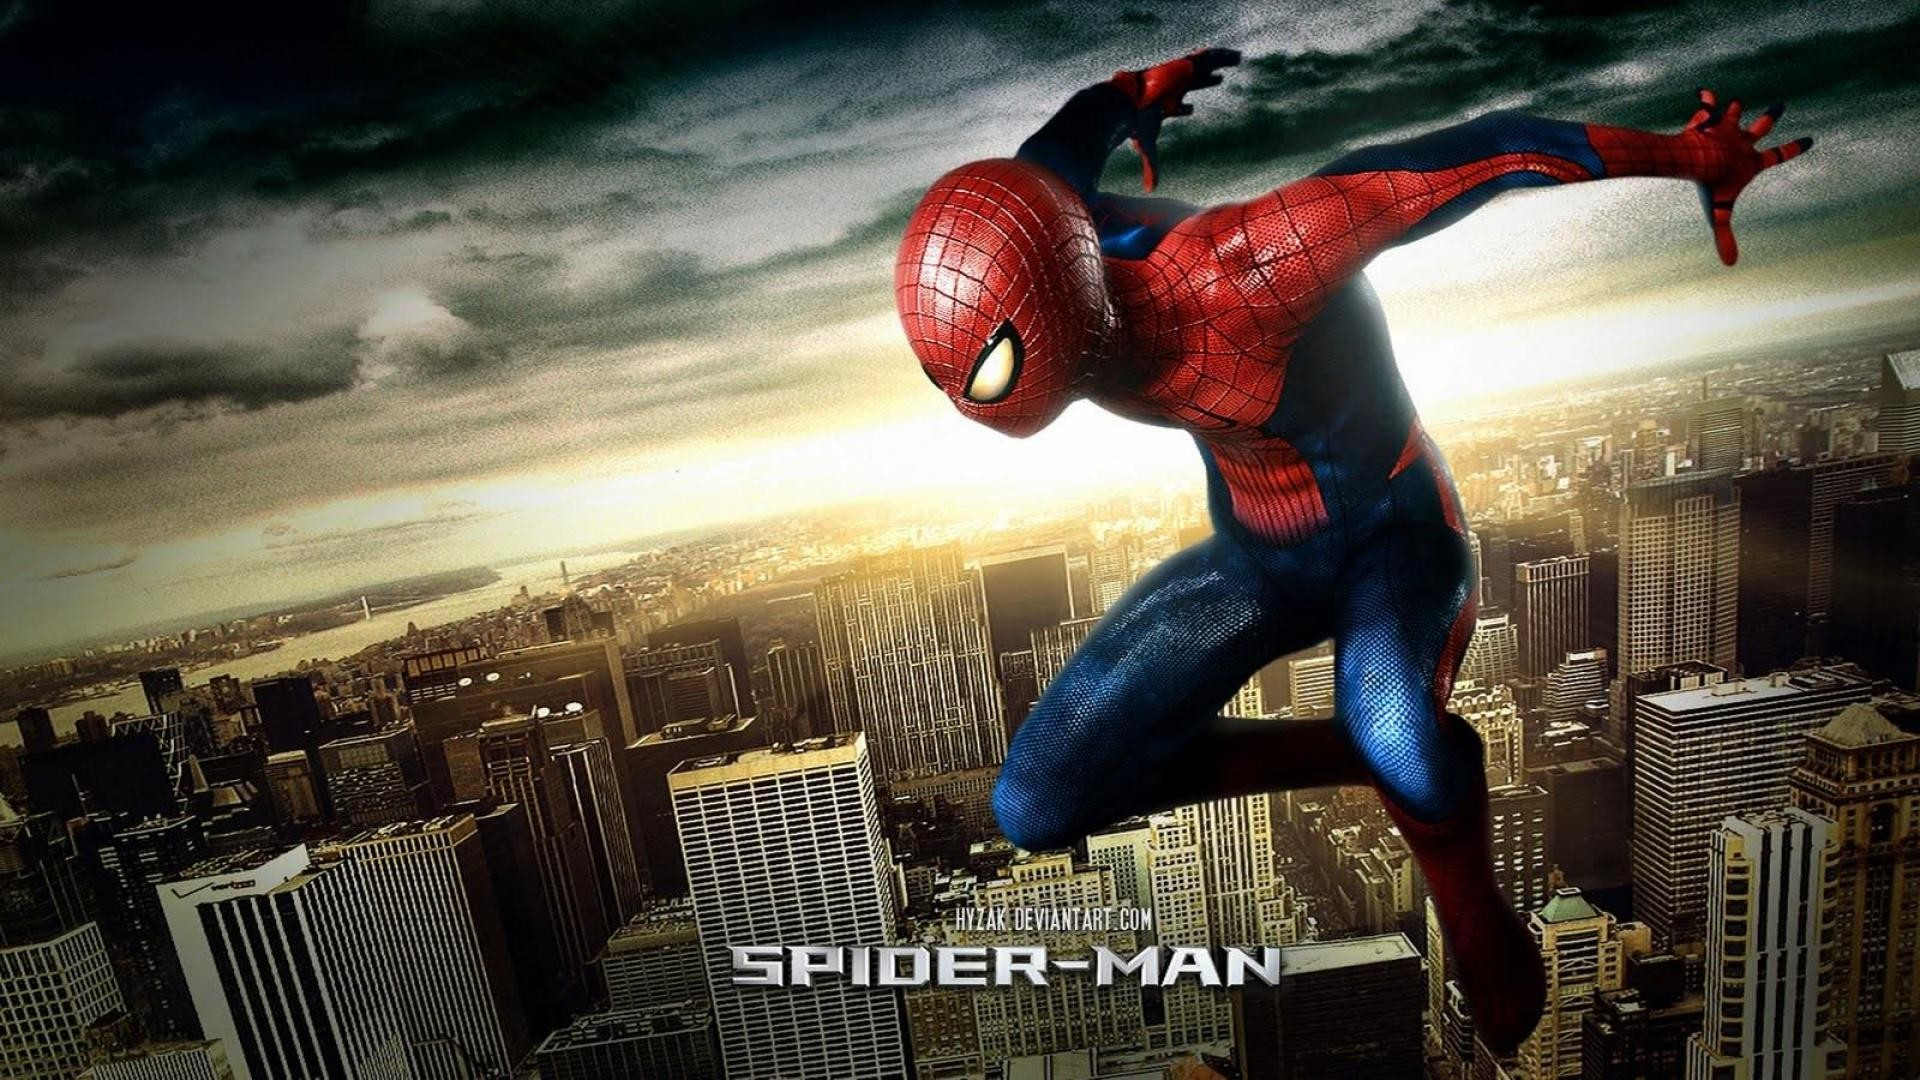 … Spiderman HD Wallpapers, Desktop Backgrounds, Mobile Wallpapers .